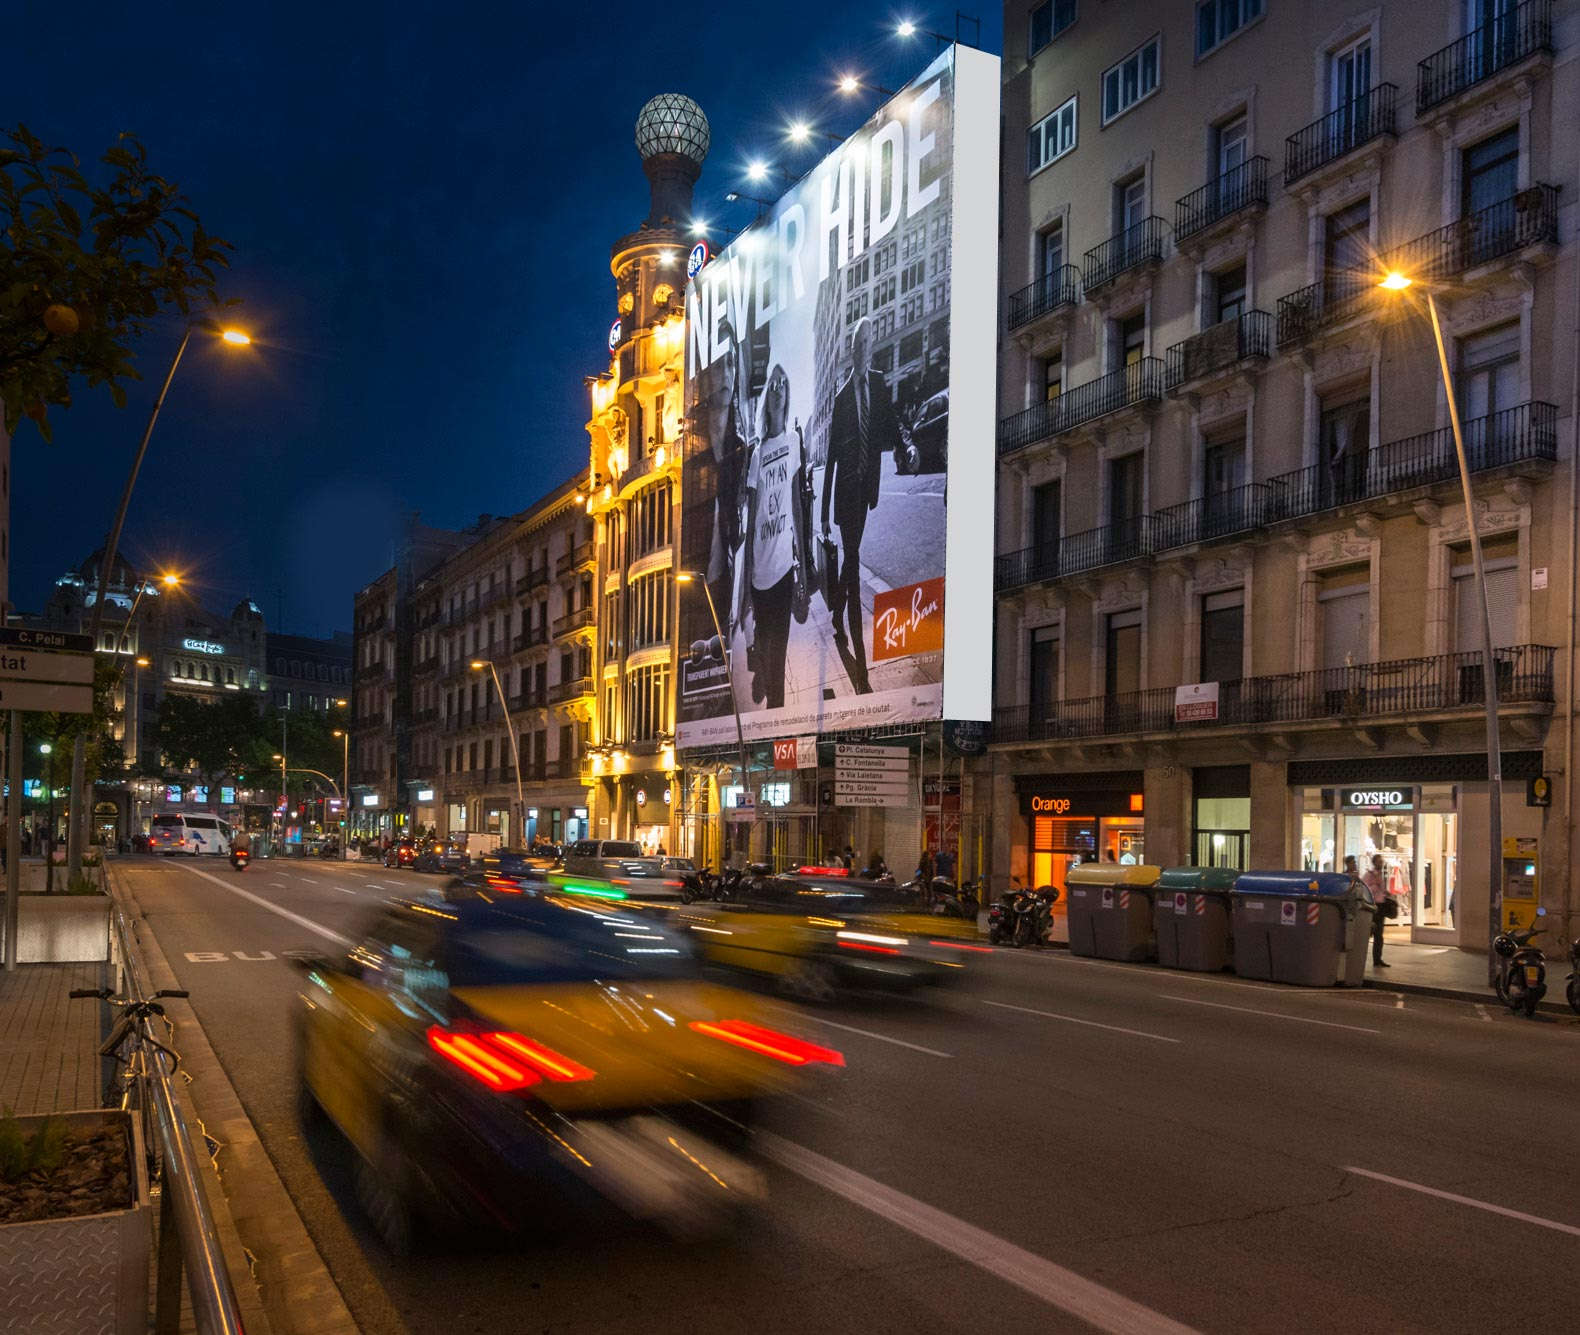 lona-publicitaria-barcelona-ray-ban-pelayo-2-vsa-comunicacion